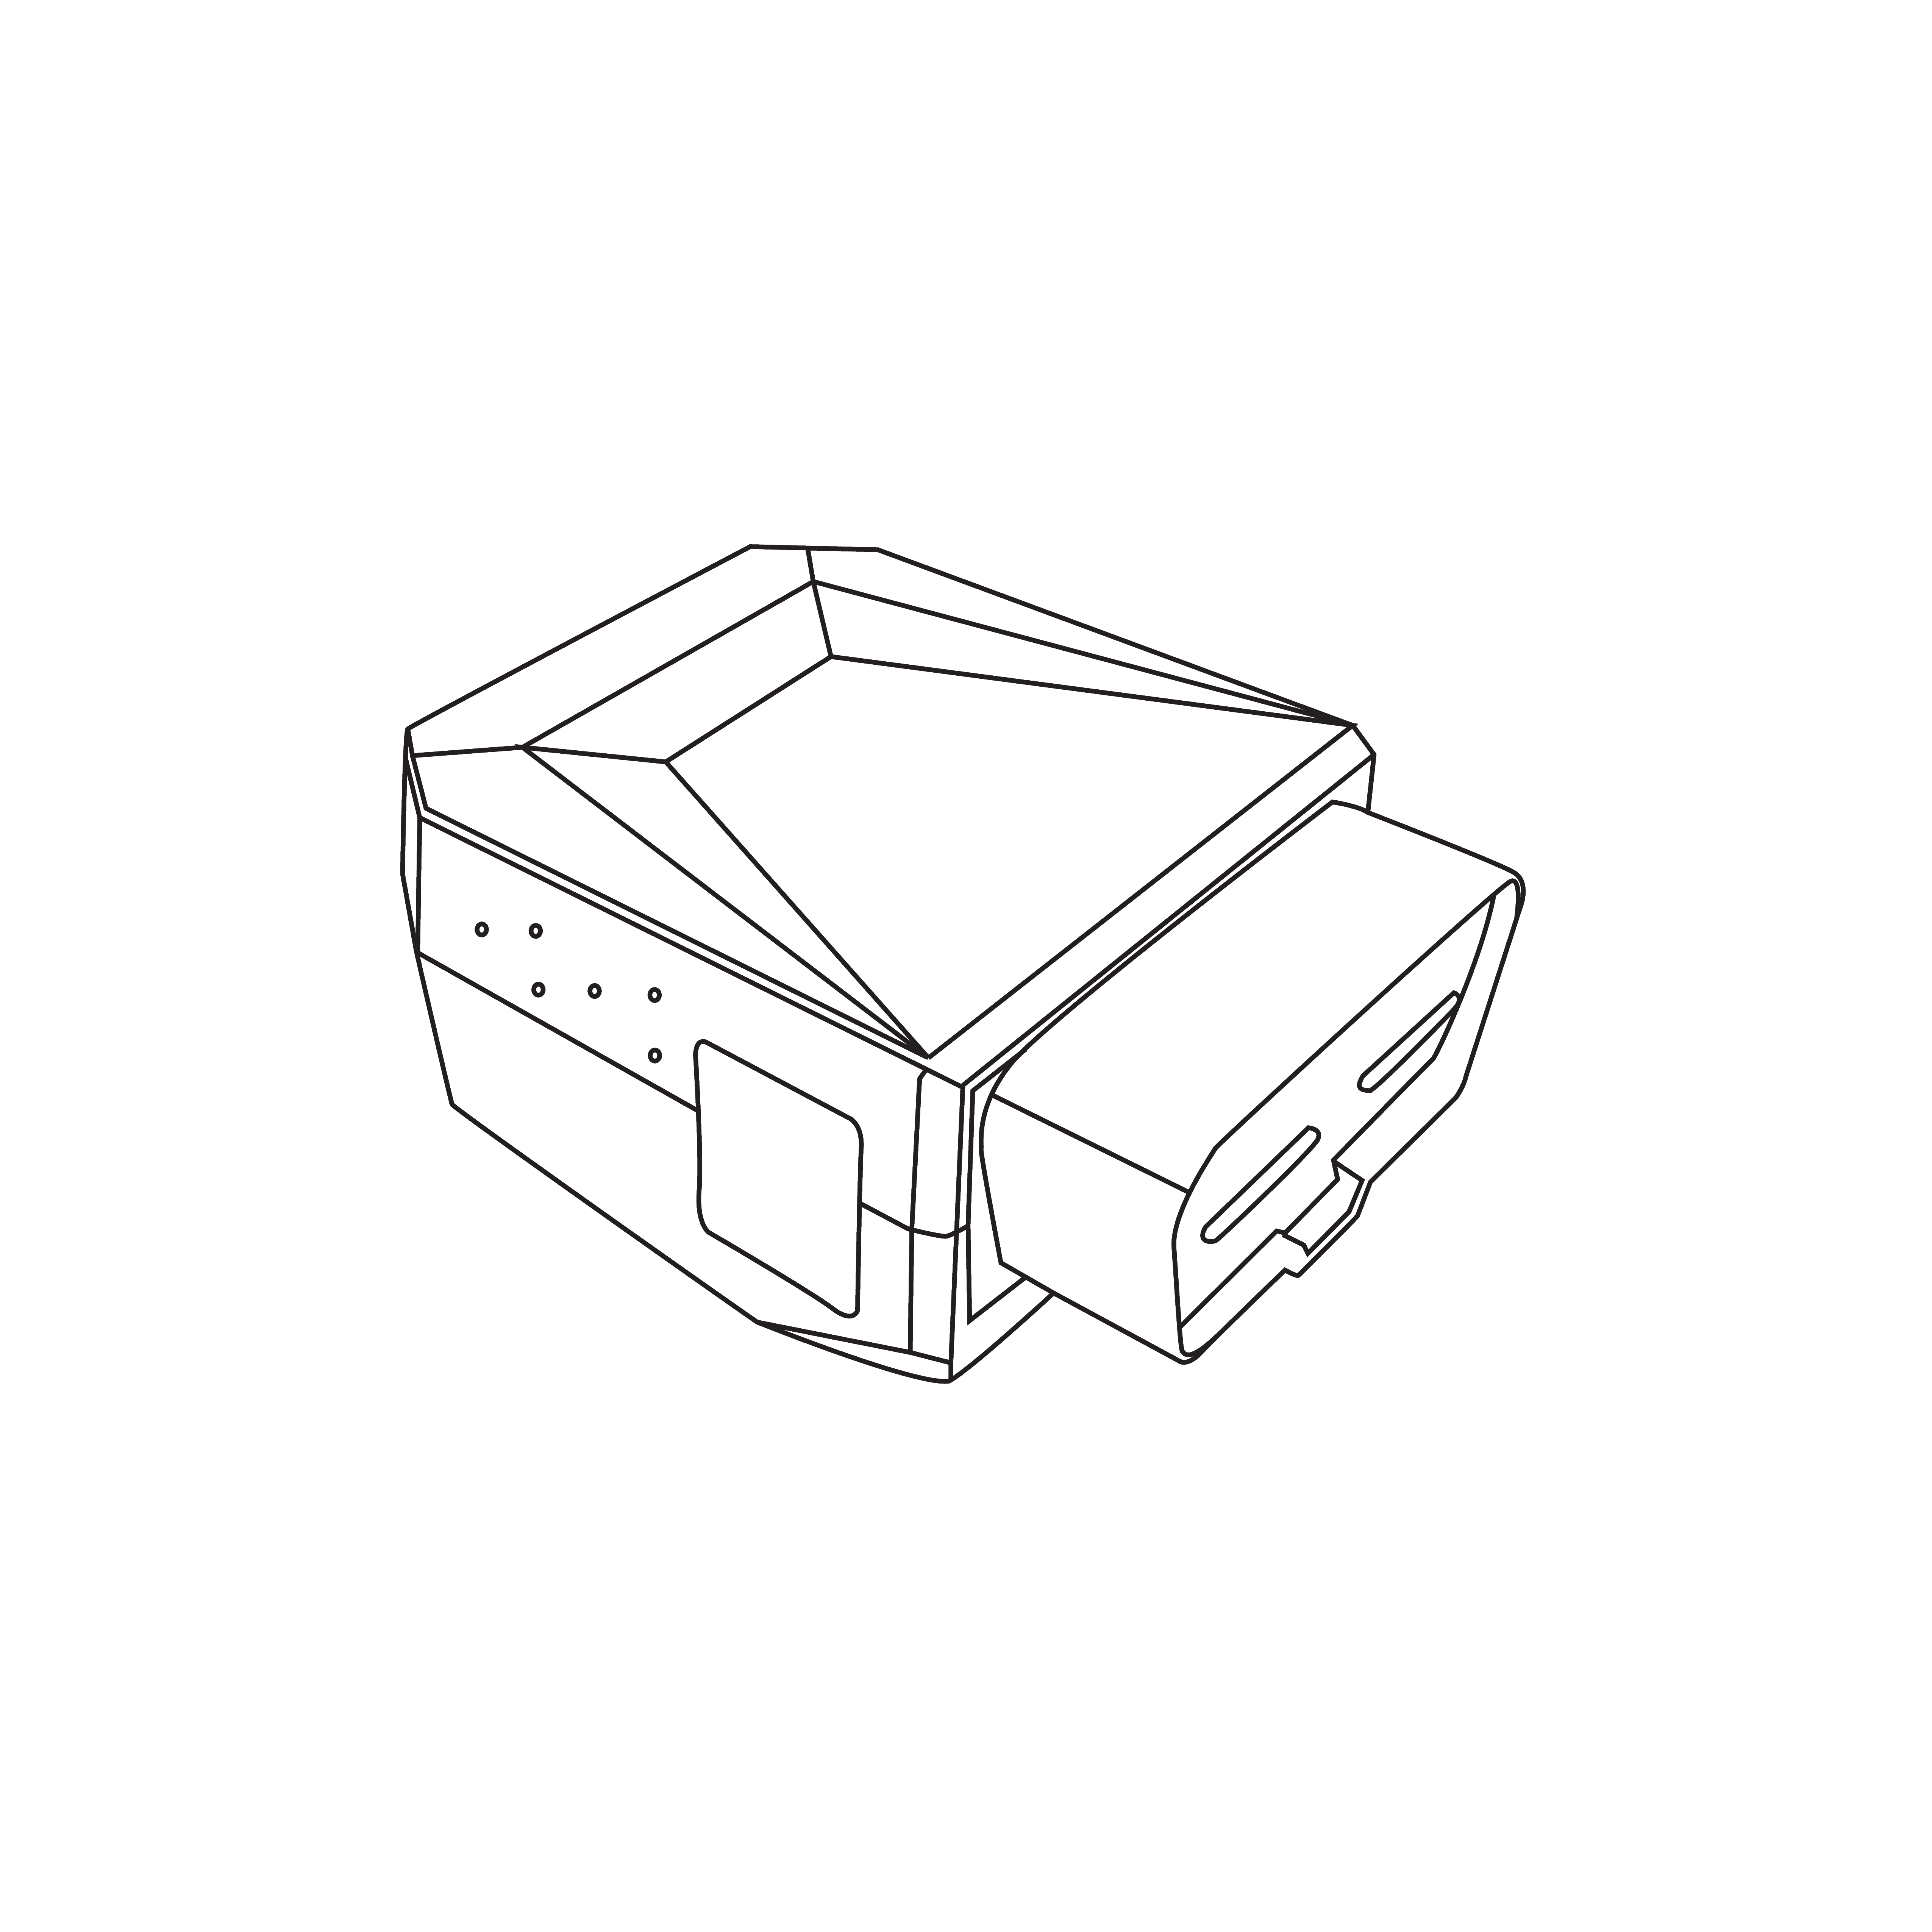 iOn-Vision-Landing-Page-Assets_01_LMU-3240